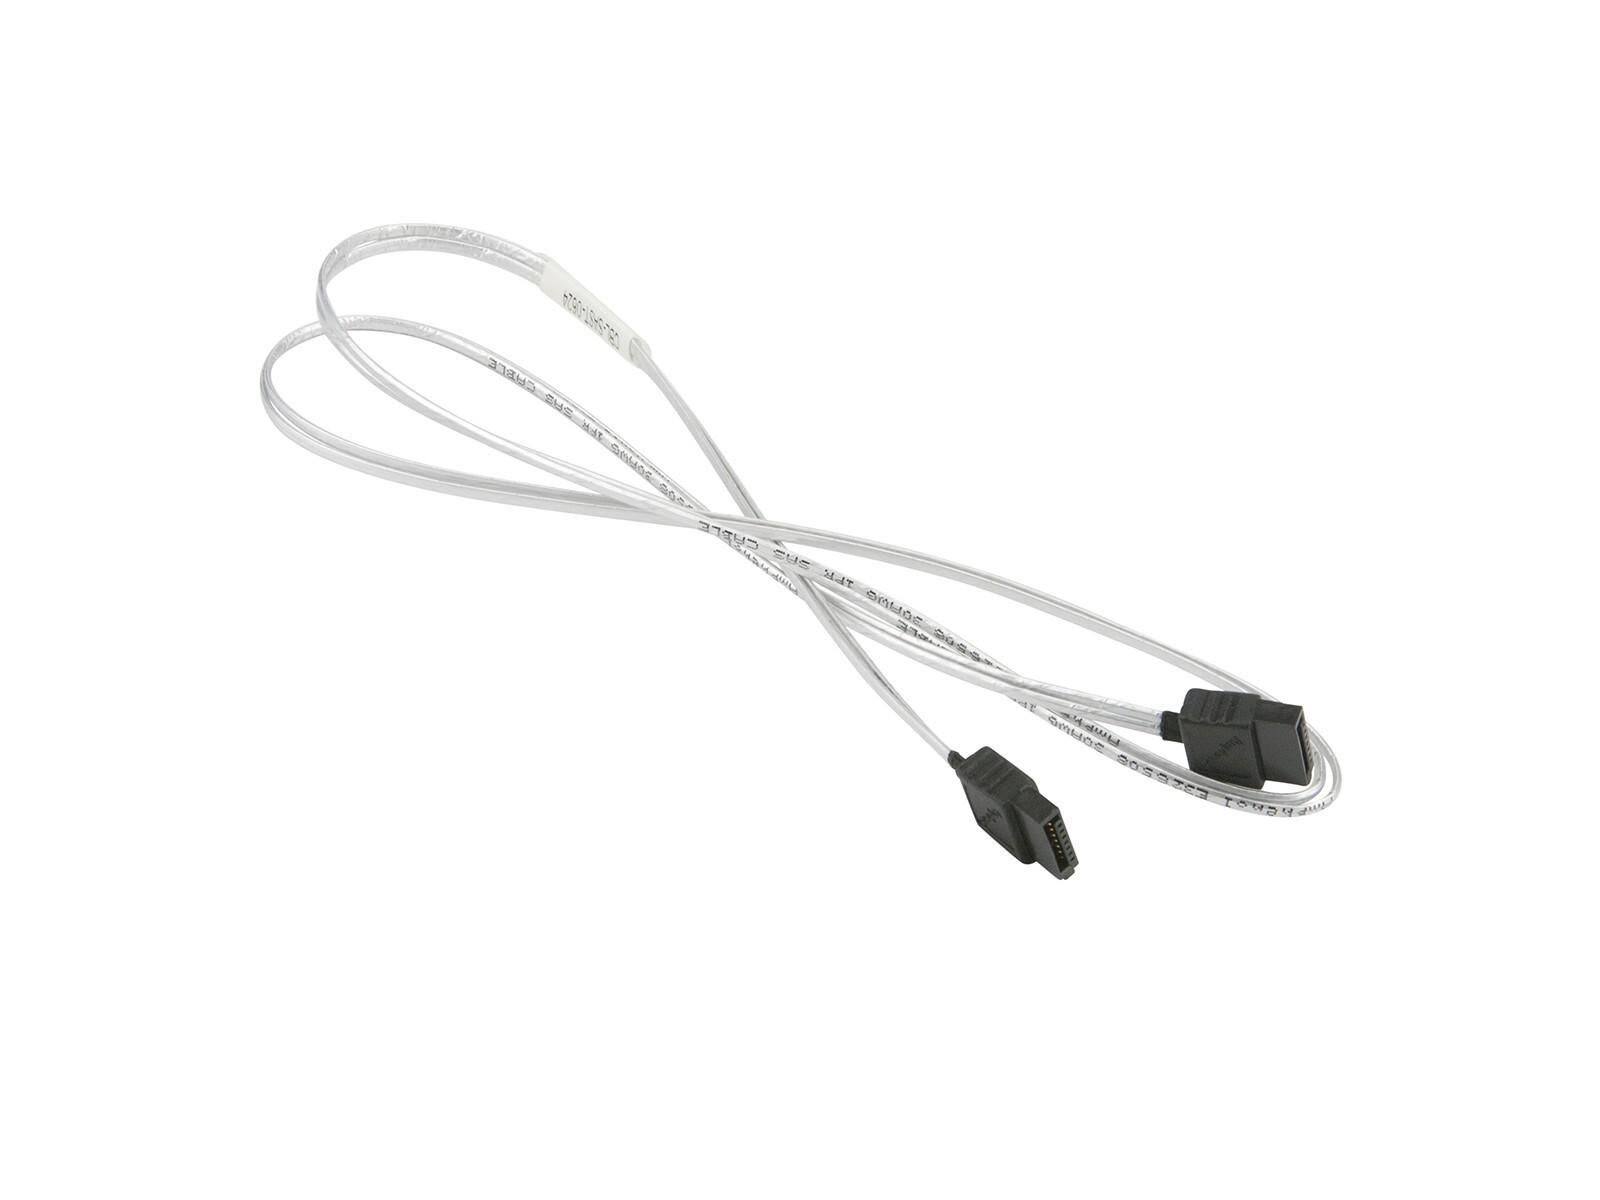 Supermicro Cable AOC-ML-4S